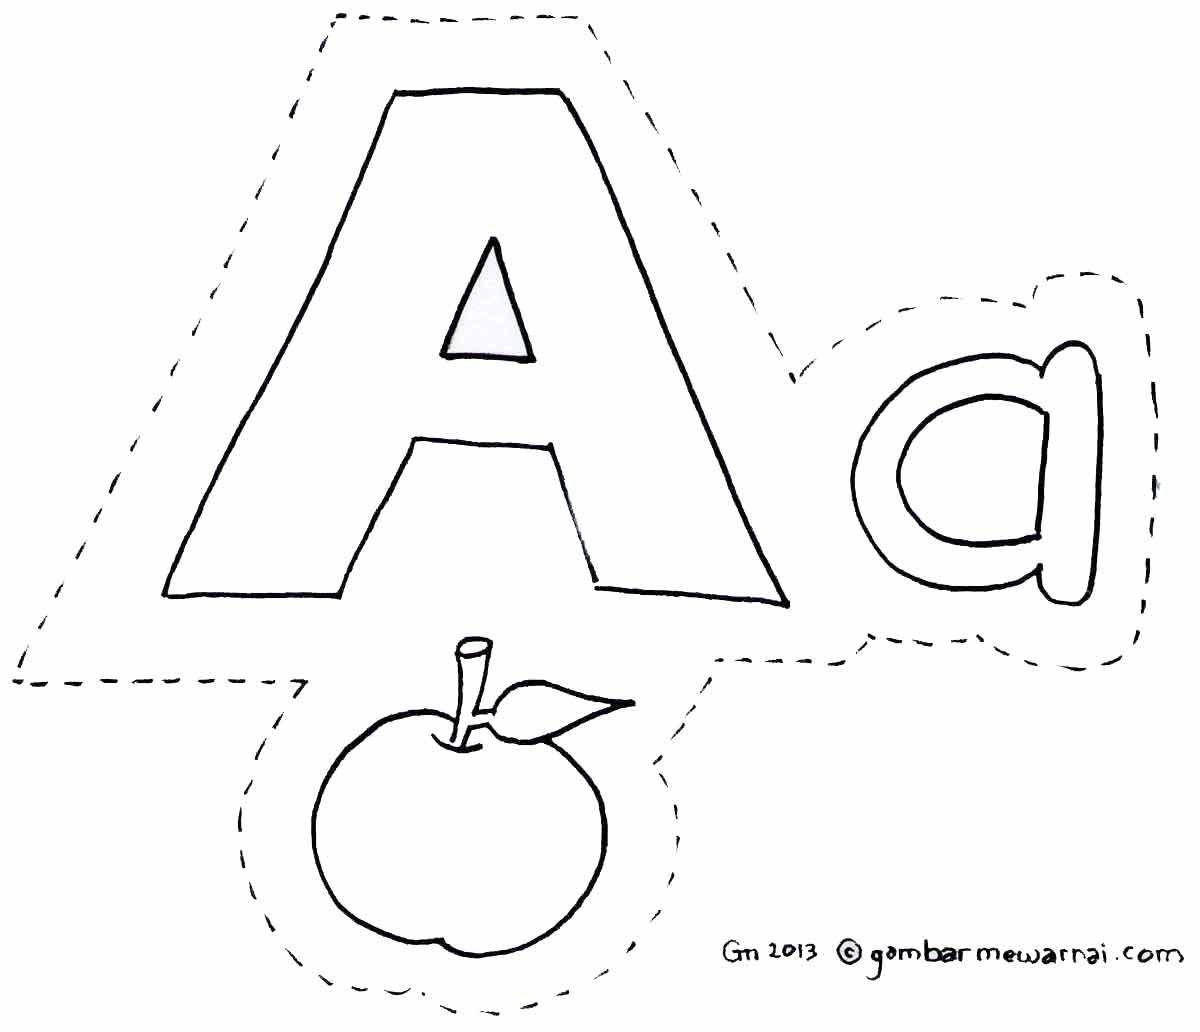 Gambar Mewarnai Abjad Cari Bahan Mengajar Untuk Anak Anak